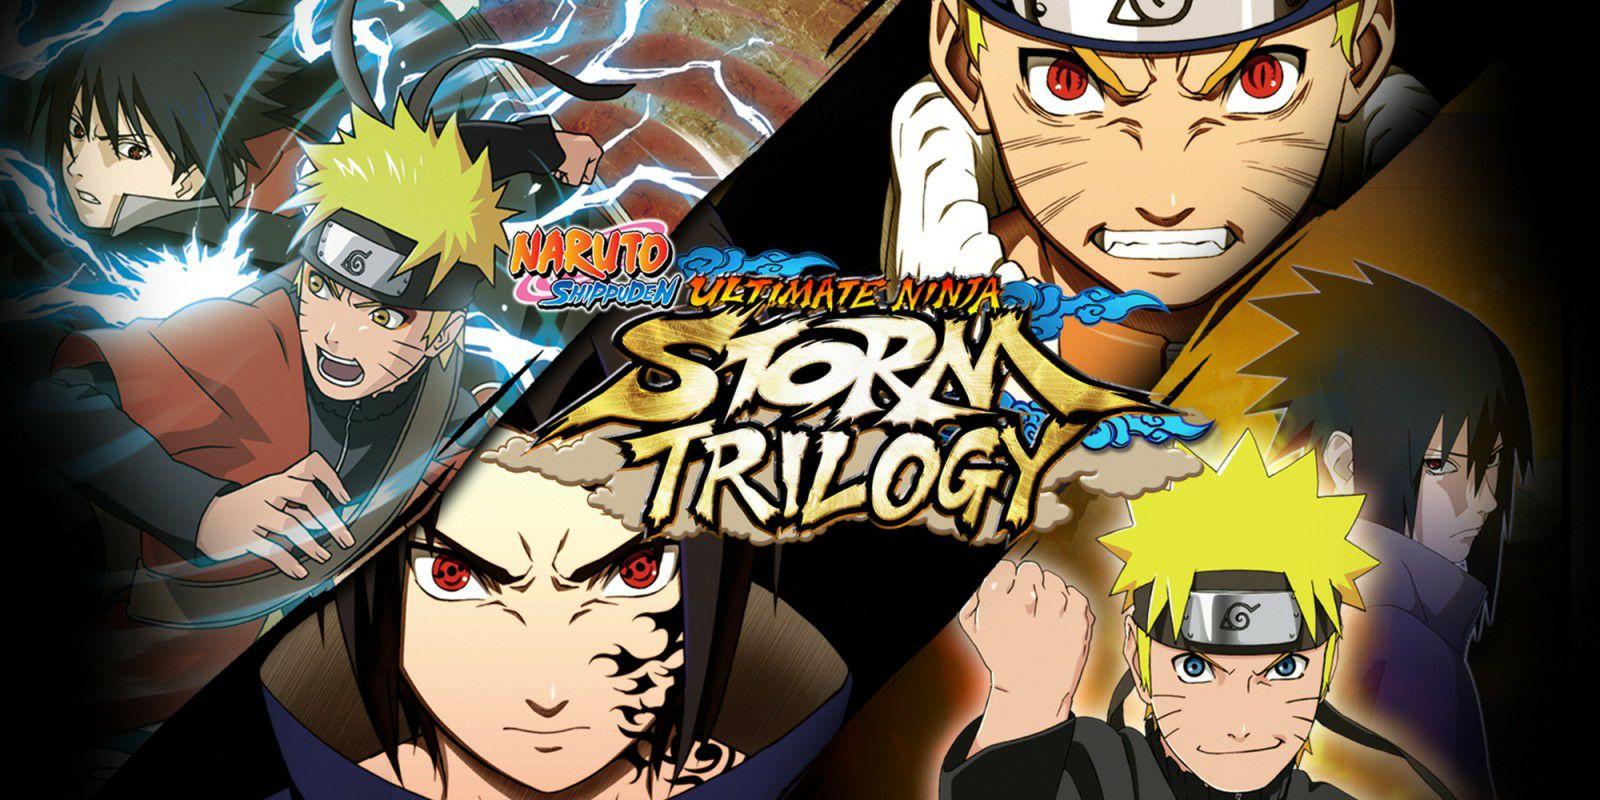 Naruto Shippuden : Ultimate Ninja Storm Trilogy Sur Nintendo Switch (Dématérialisé)